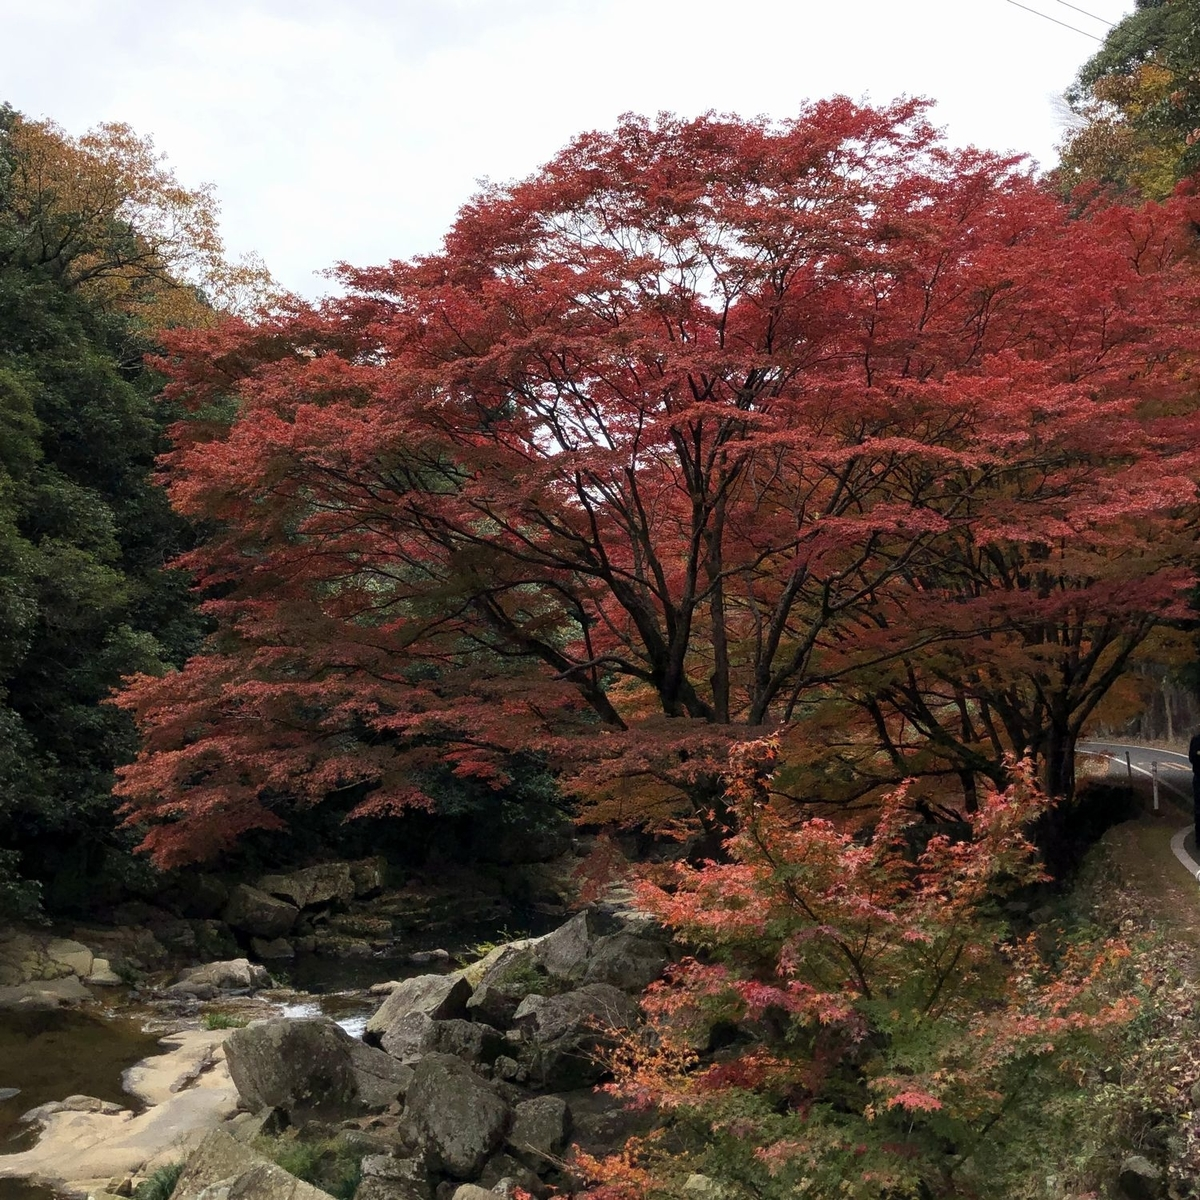 f:id:shiratsume:20191125200817j:plain